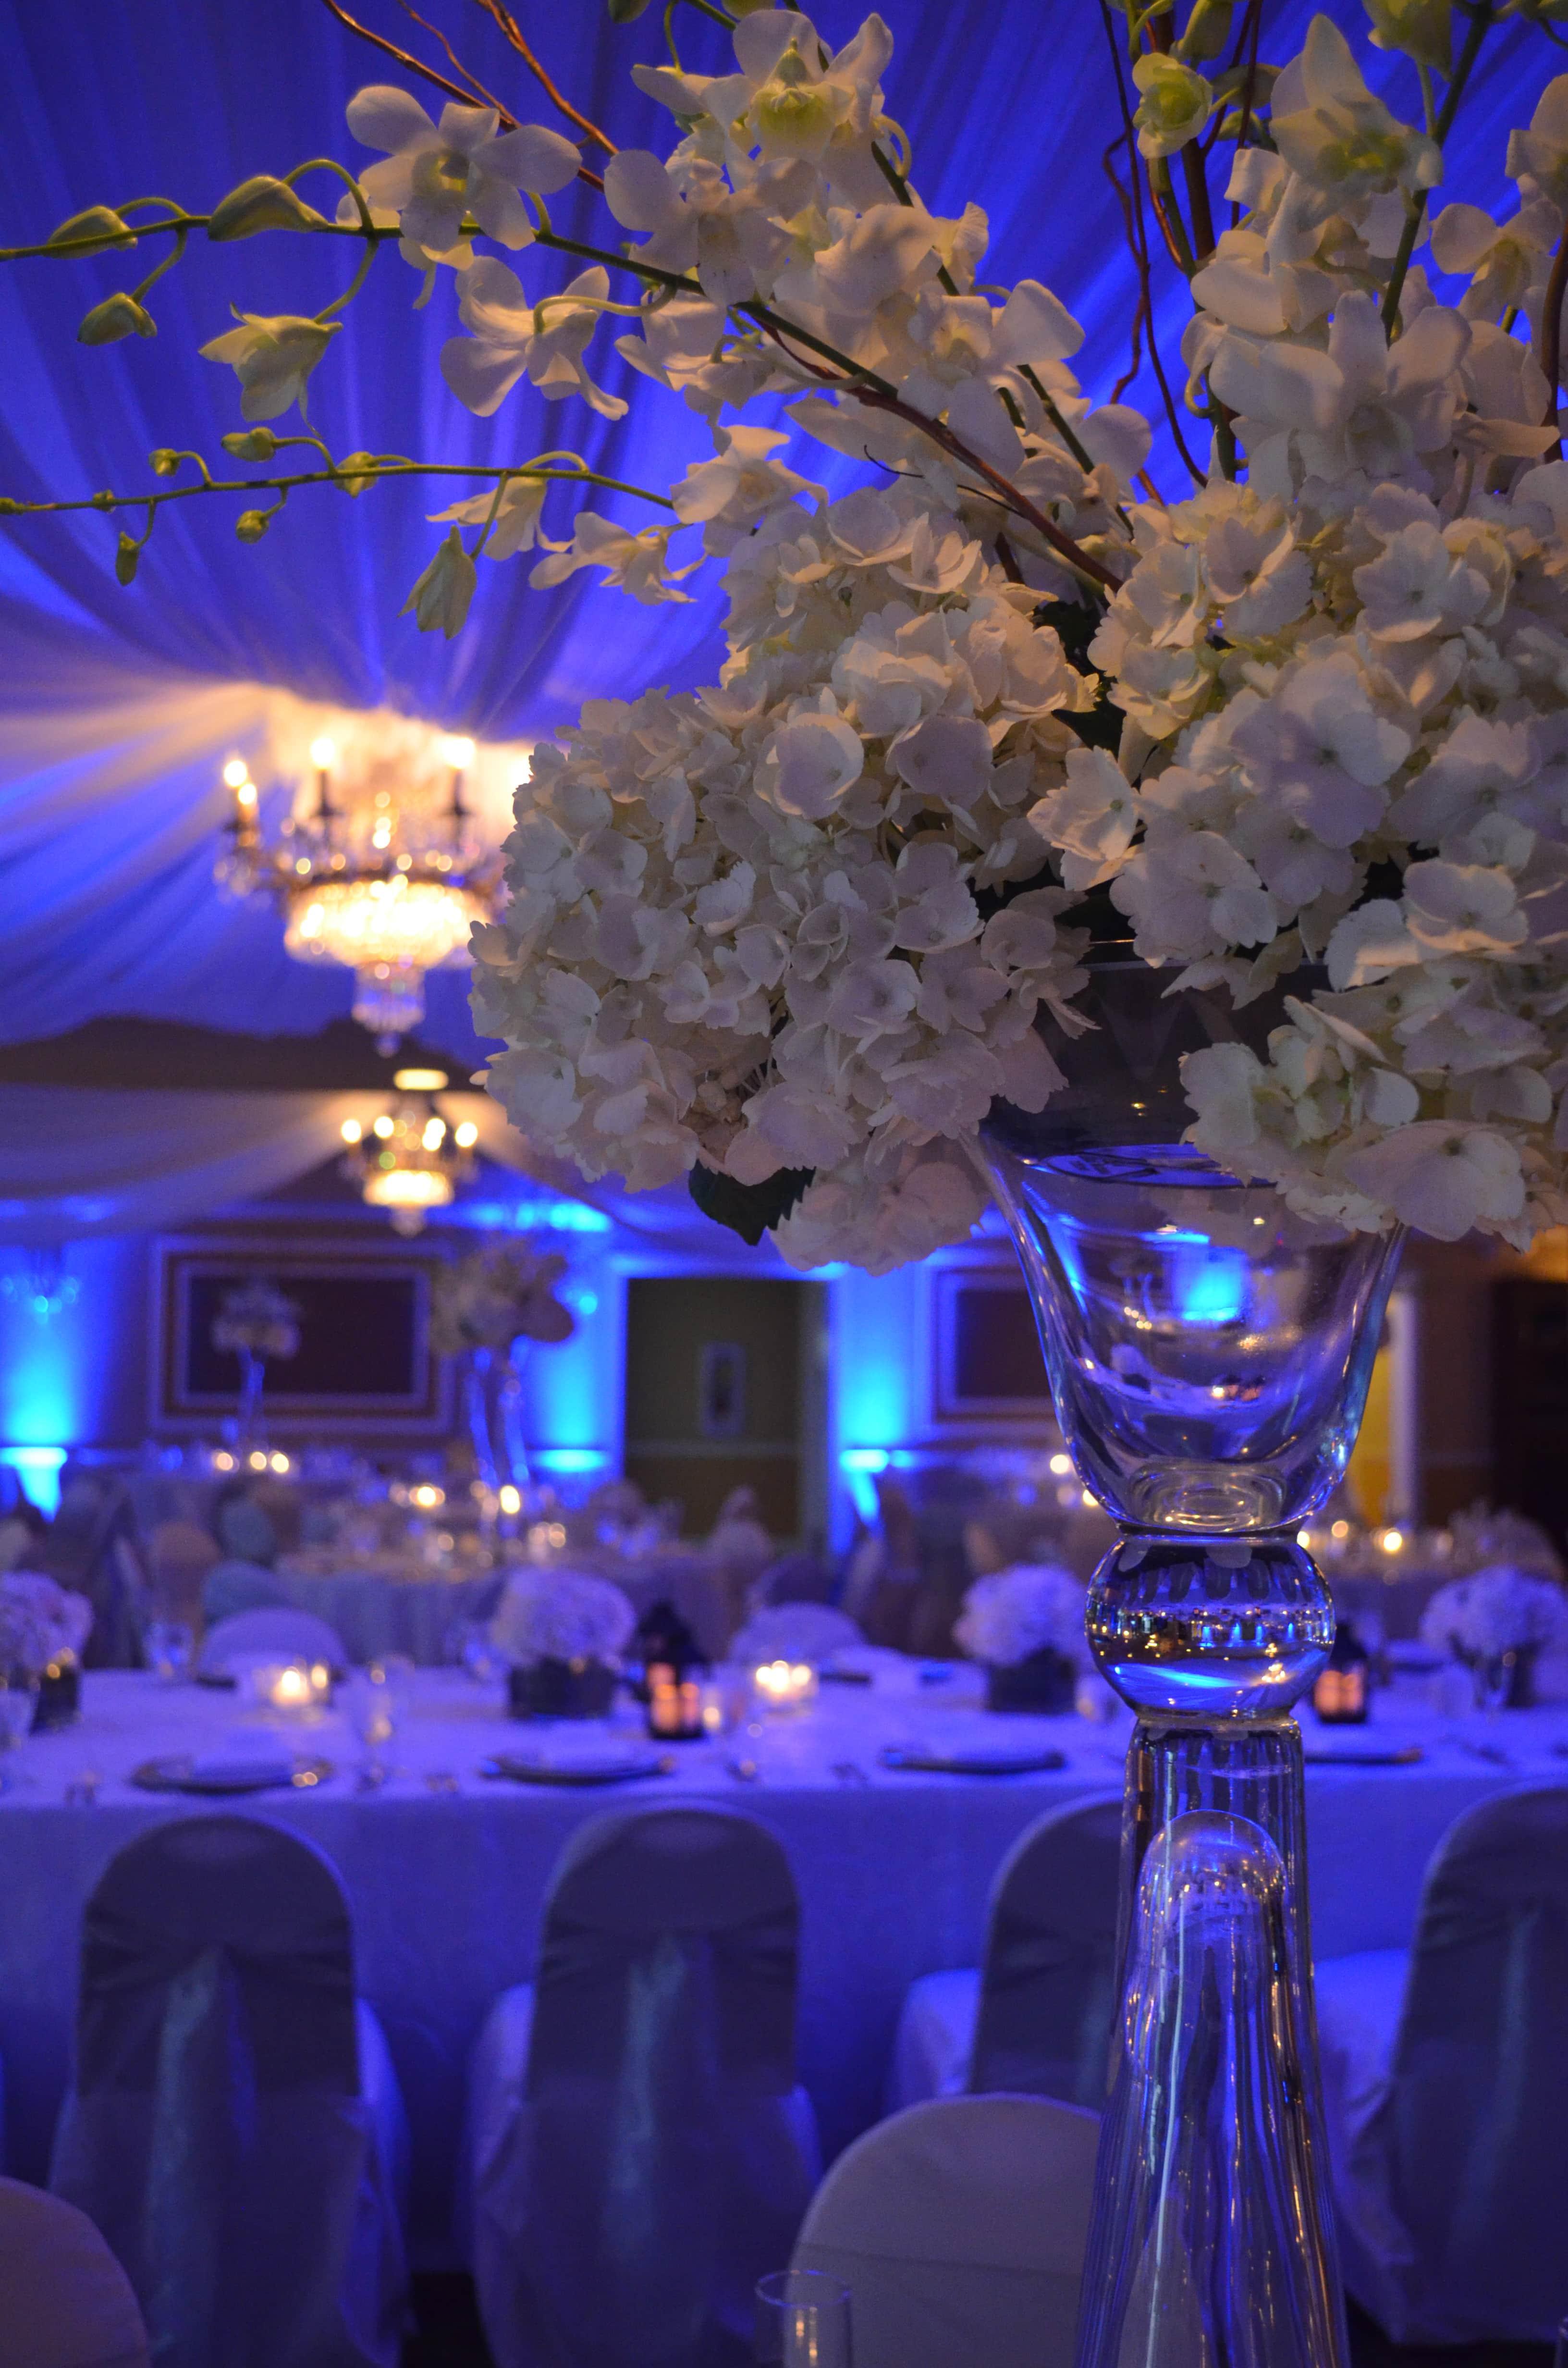 Jennifer Amp Joshua Gazebo Ceremony And Wedding Reception